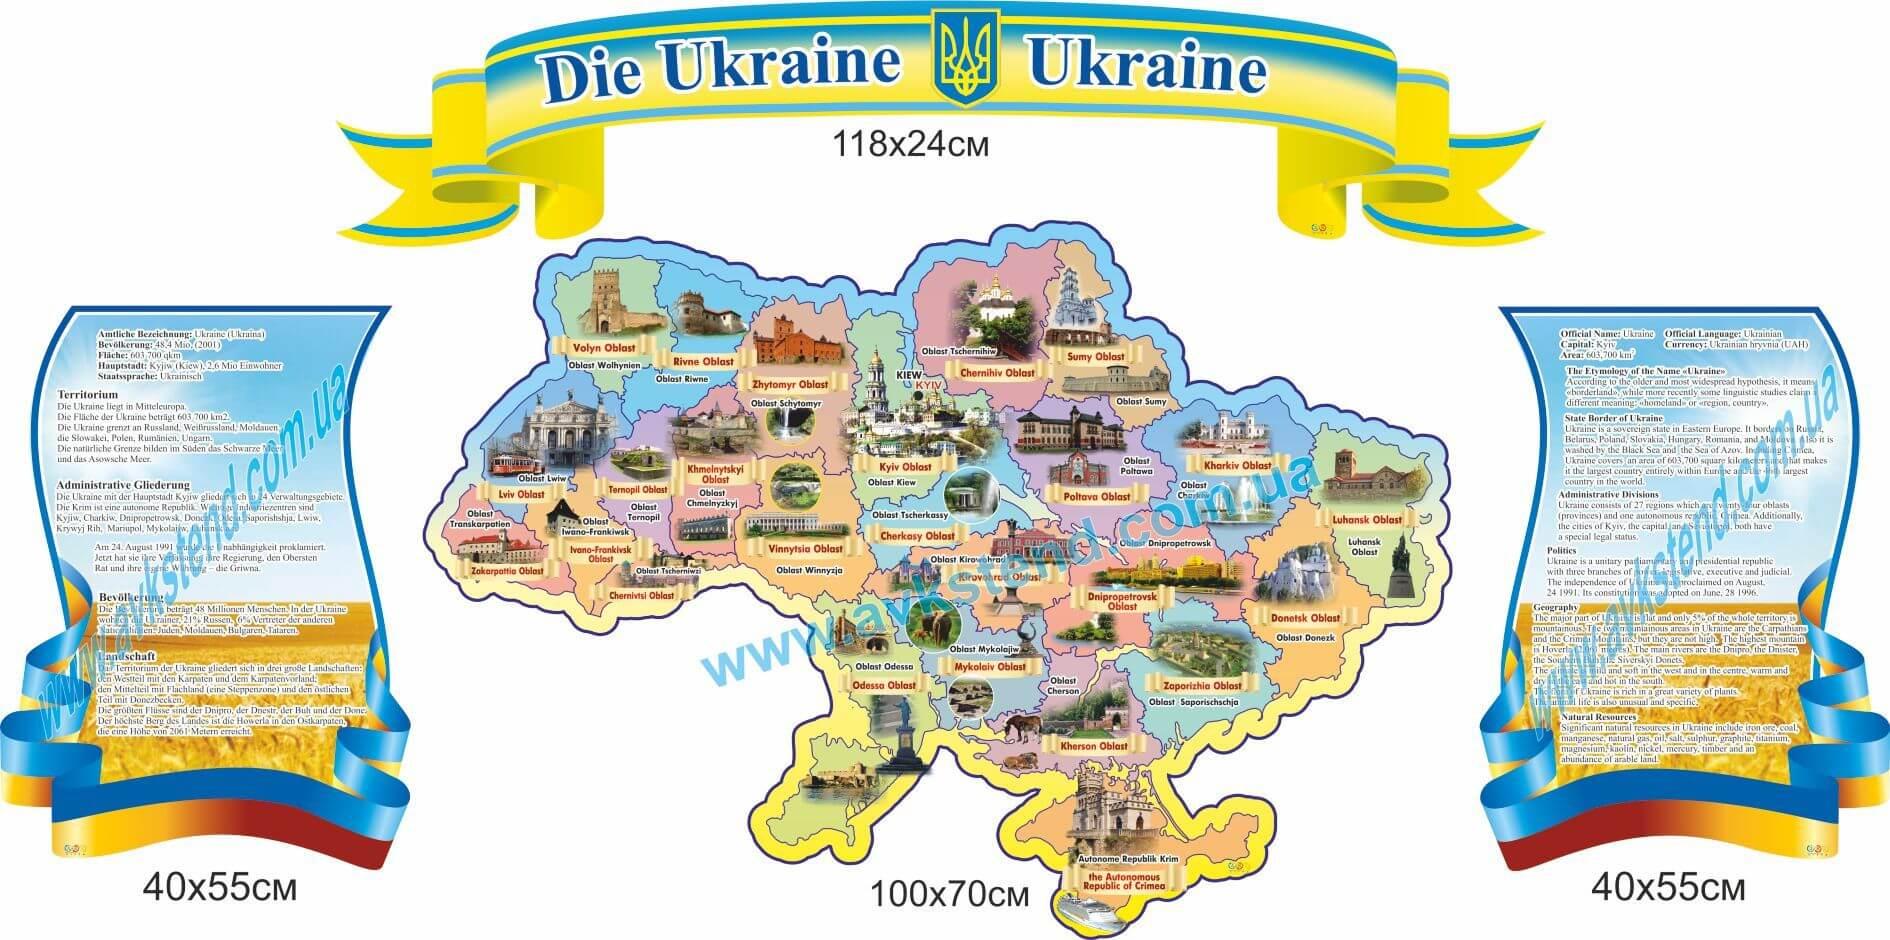 стенди для кабінету іноземної мови, стенды для кабинета иностранного языка, стенди для кабінету англійської мови купити, кабінет англійської мови, стенди для шкільних кабінетів замовити, стенды для кабинета английского языка купить, кабинет английского языка, стенды для школьных кабинетов заказать, Україна, Украина, стенди для кабінету німецької мови купити, кабінет німецької мови, стенди для шкільних кабінетів замовити, стенды для кабинета немецкого языка купить, кабинет немецкого языка, стенды для школьных кабинетов заказать, Україна, Украина, стенди для школи купити, стенди для школи замовити, стенди для кабінету, стенди для шкільного кабінету, оформлення кабінетів, оформлення шкільного кабінету, стенды для школы купить, стенды для школы заказать, стенды для кабинета, стенды для школьного кабинета,